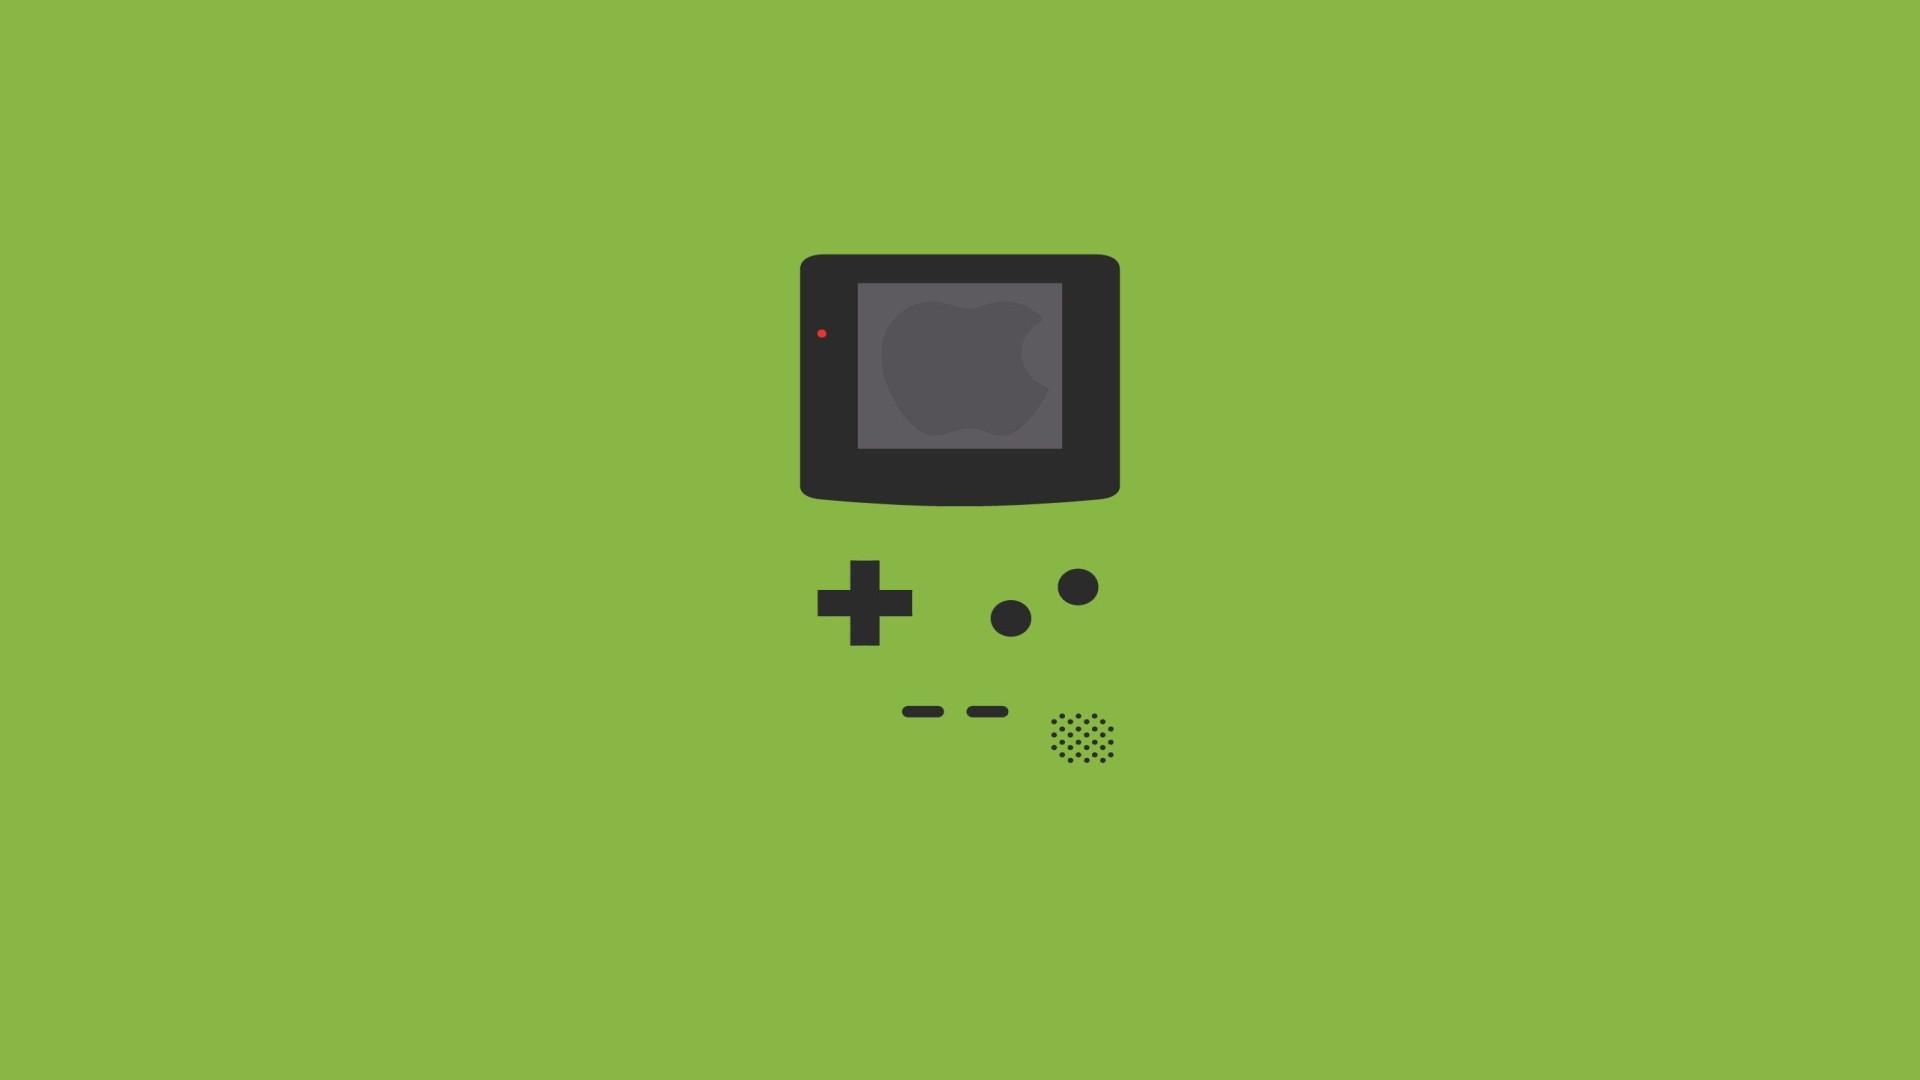 General 1920x1080 minimalism consoles video games